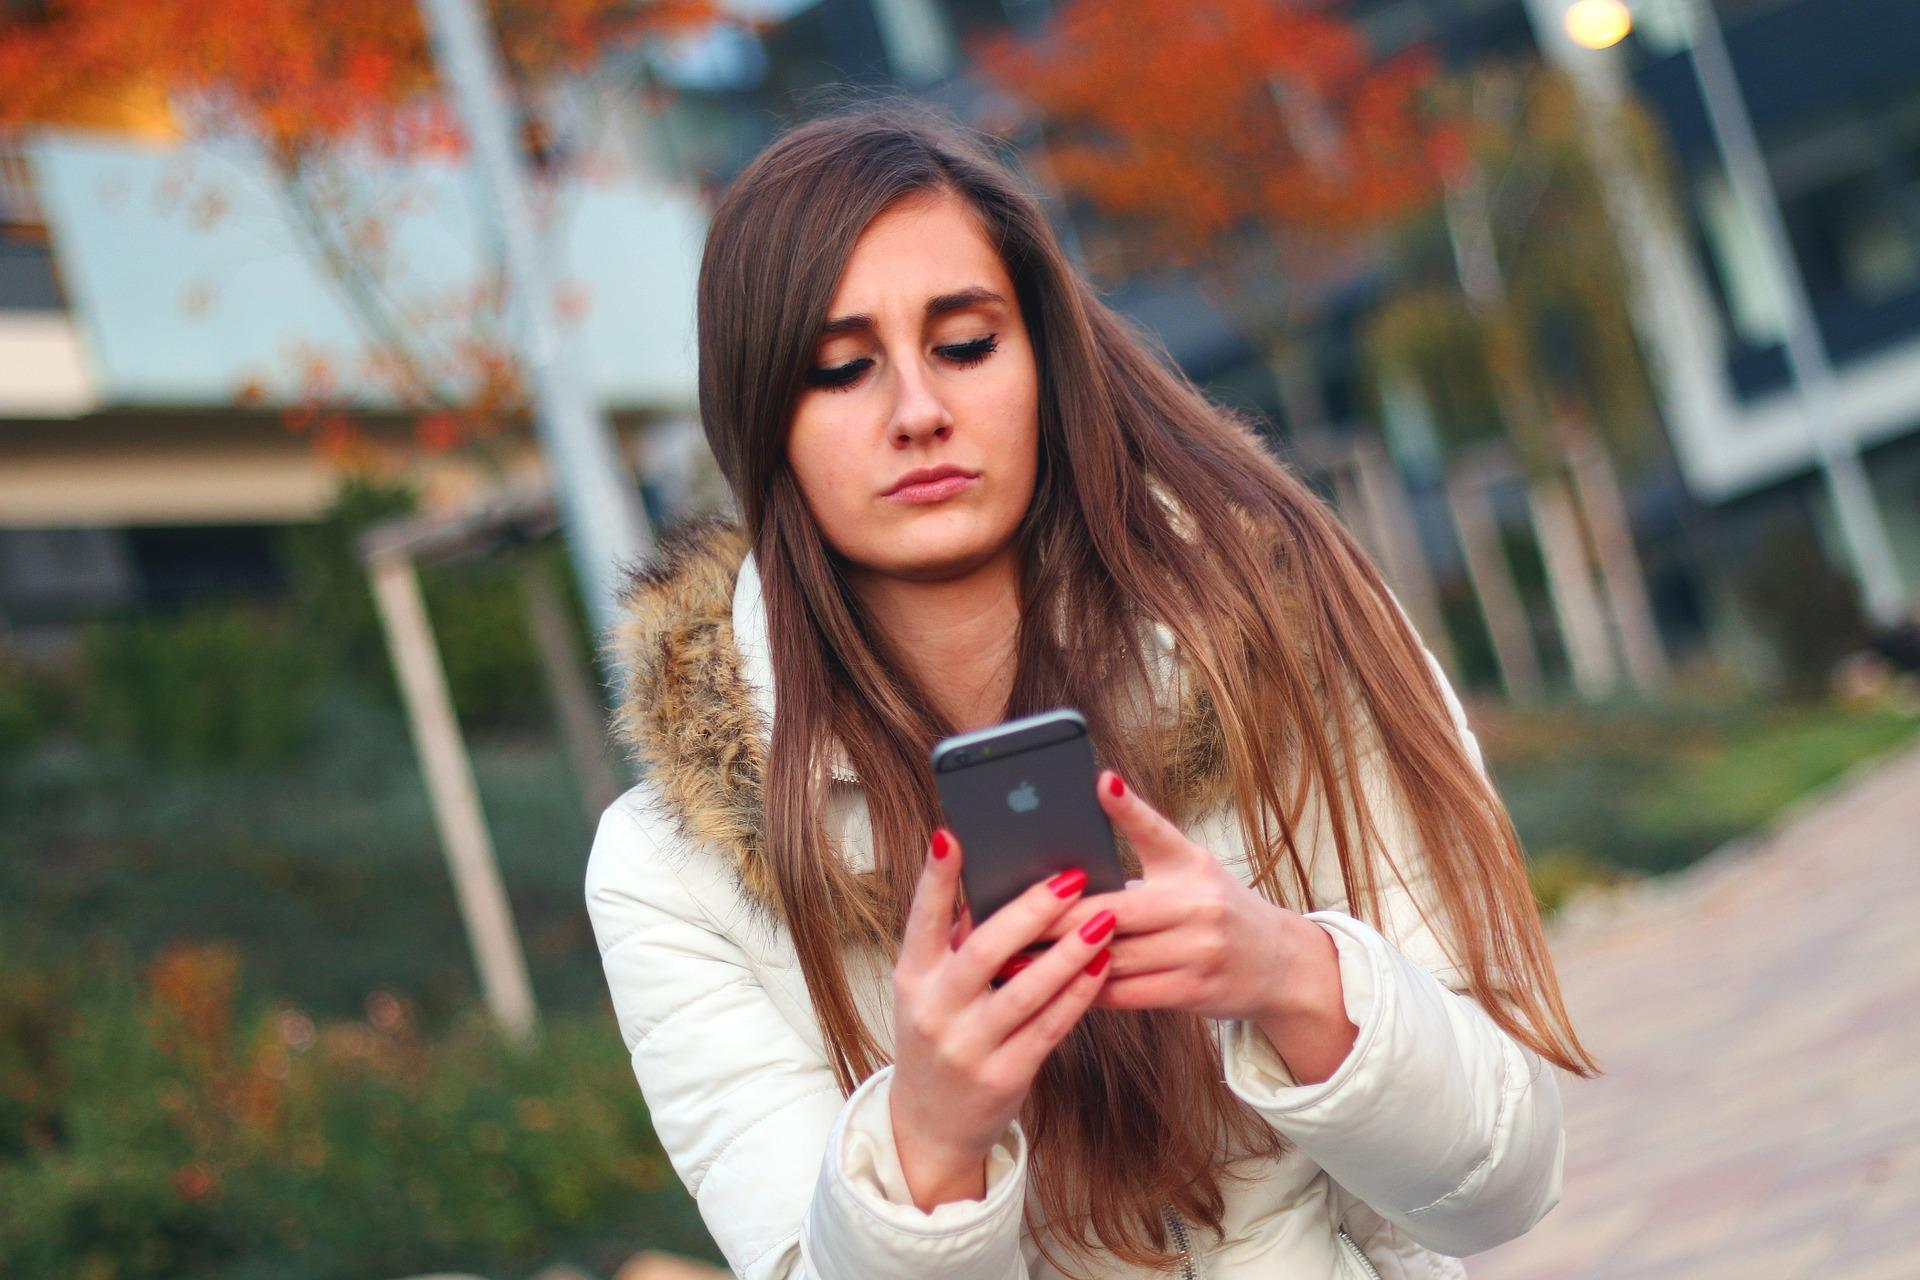 Chica-iPhone-Apple